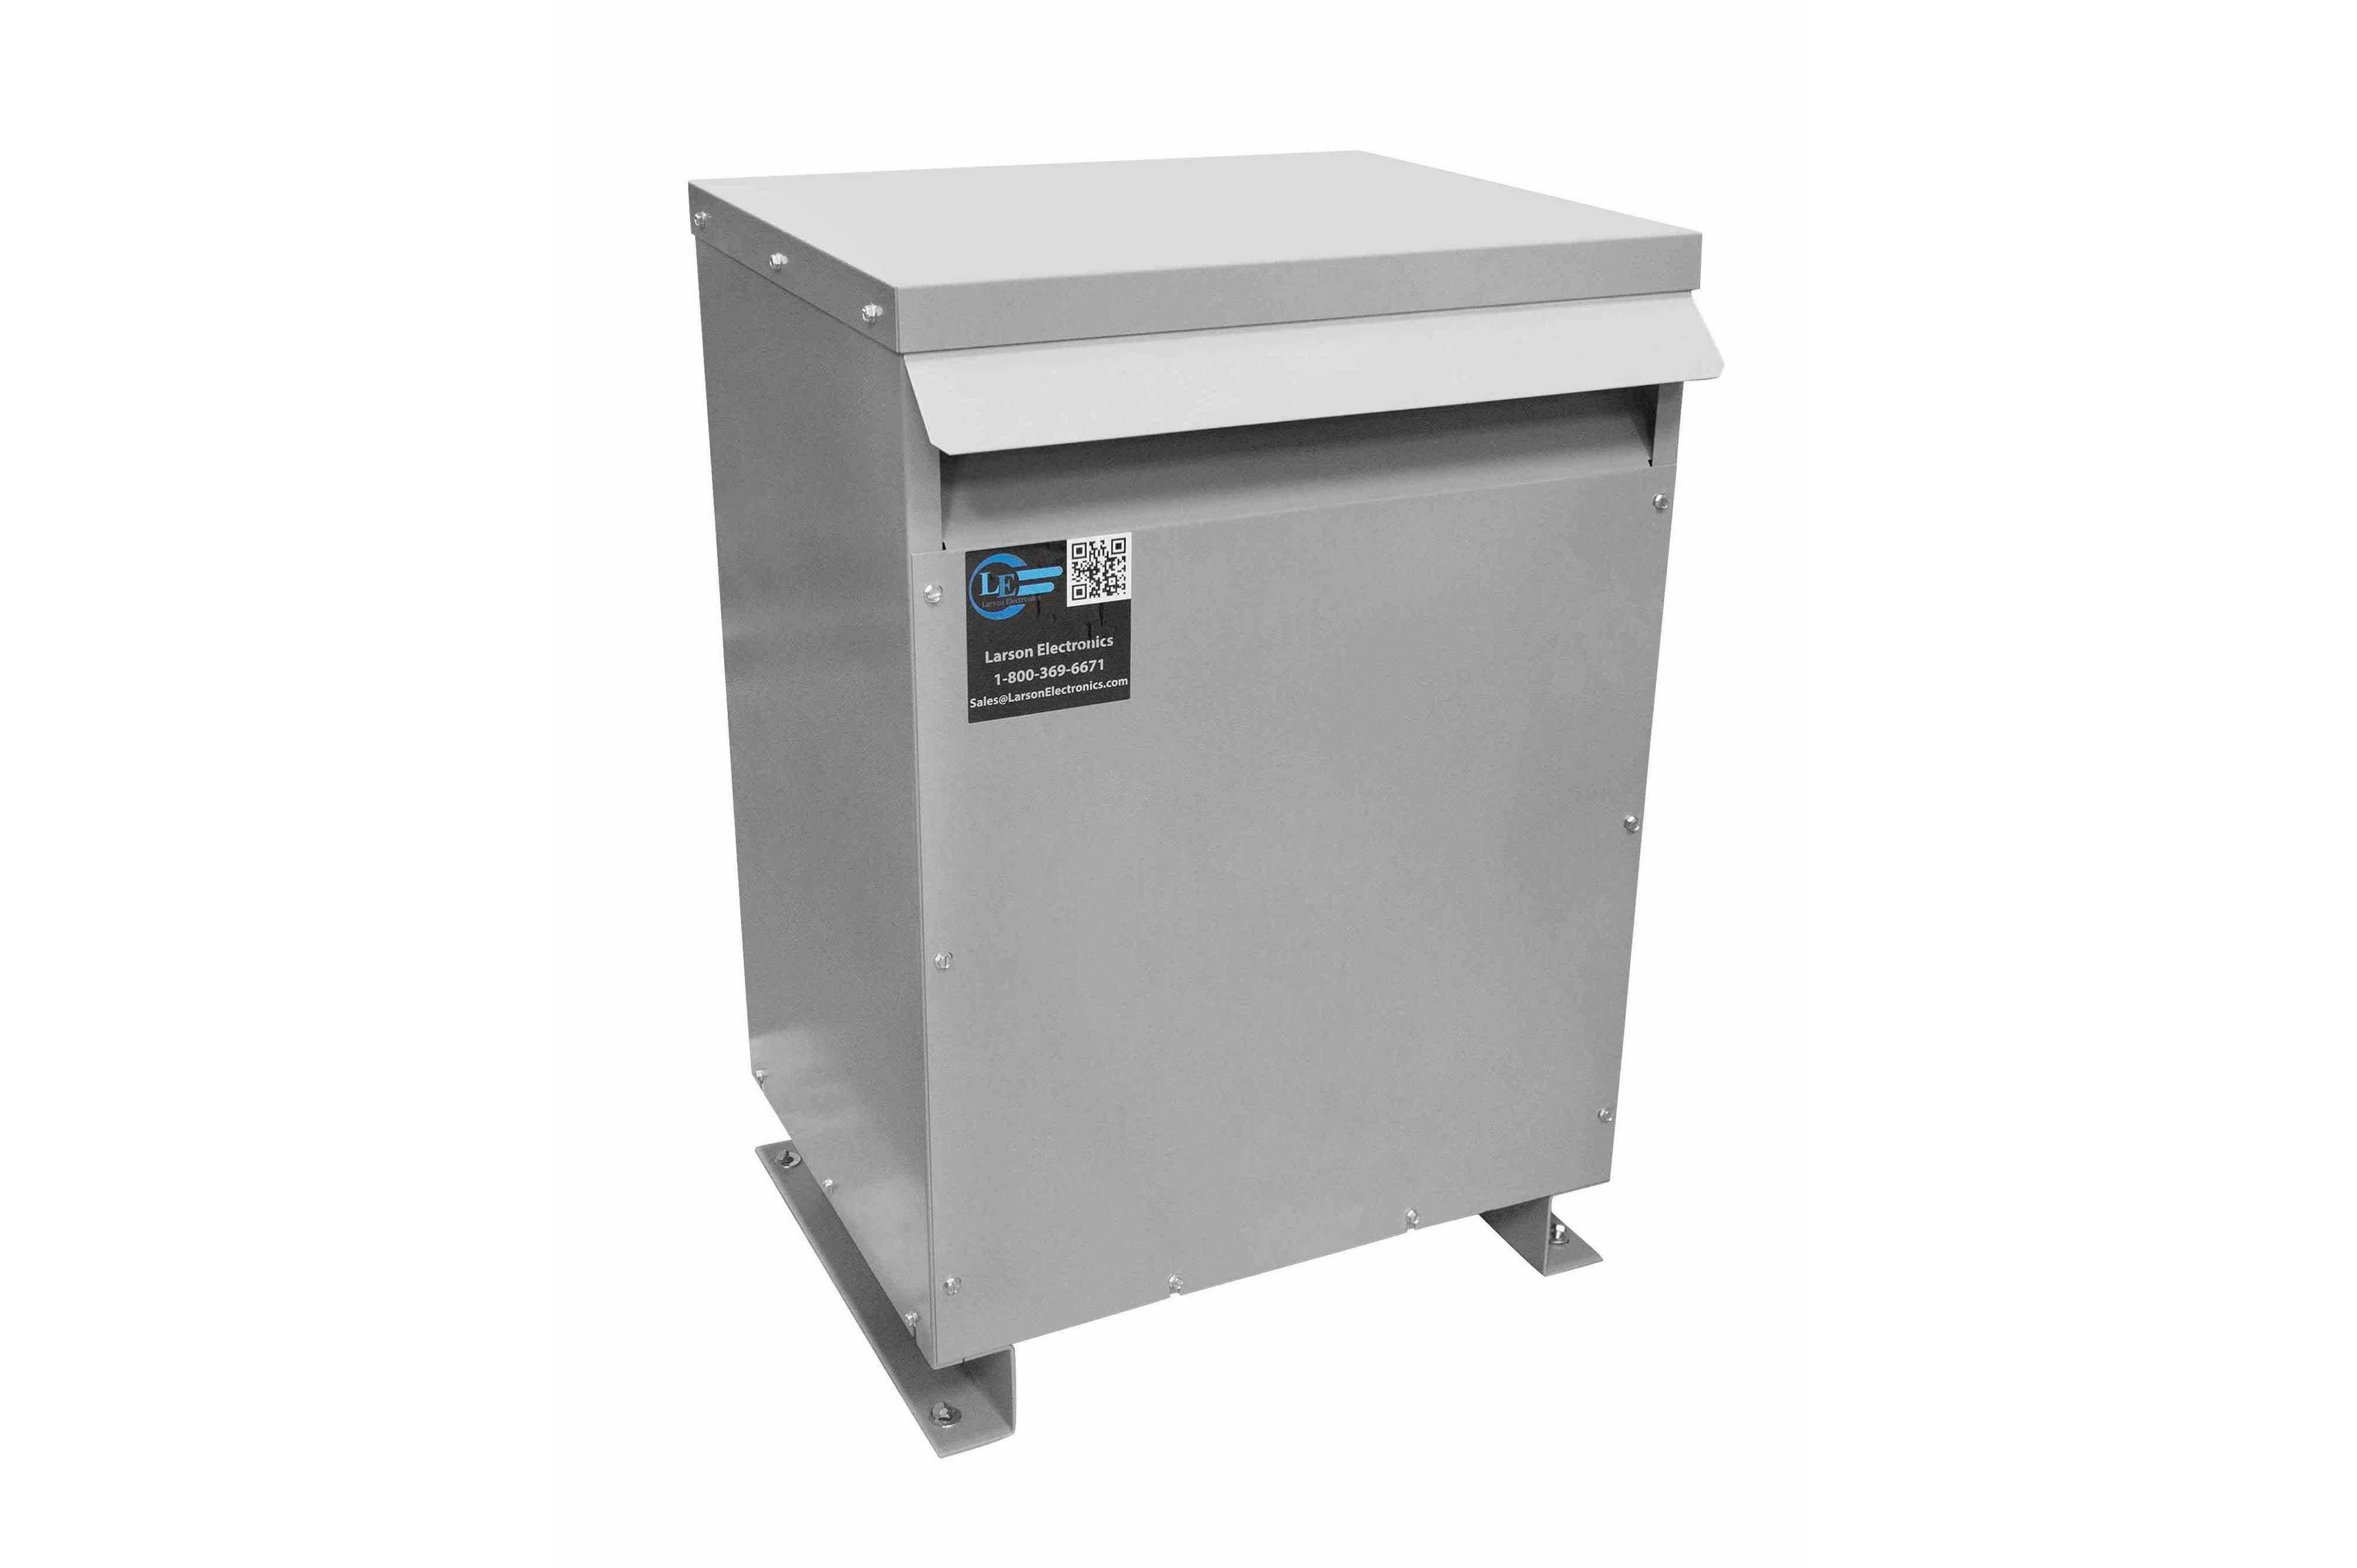 28 kVA 3PH Isolation Transformer, 440V Wye Primary, 240V Delta Secondary, N3R, Ventilated, 60 Hz